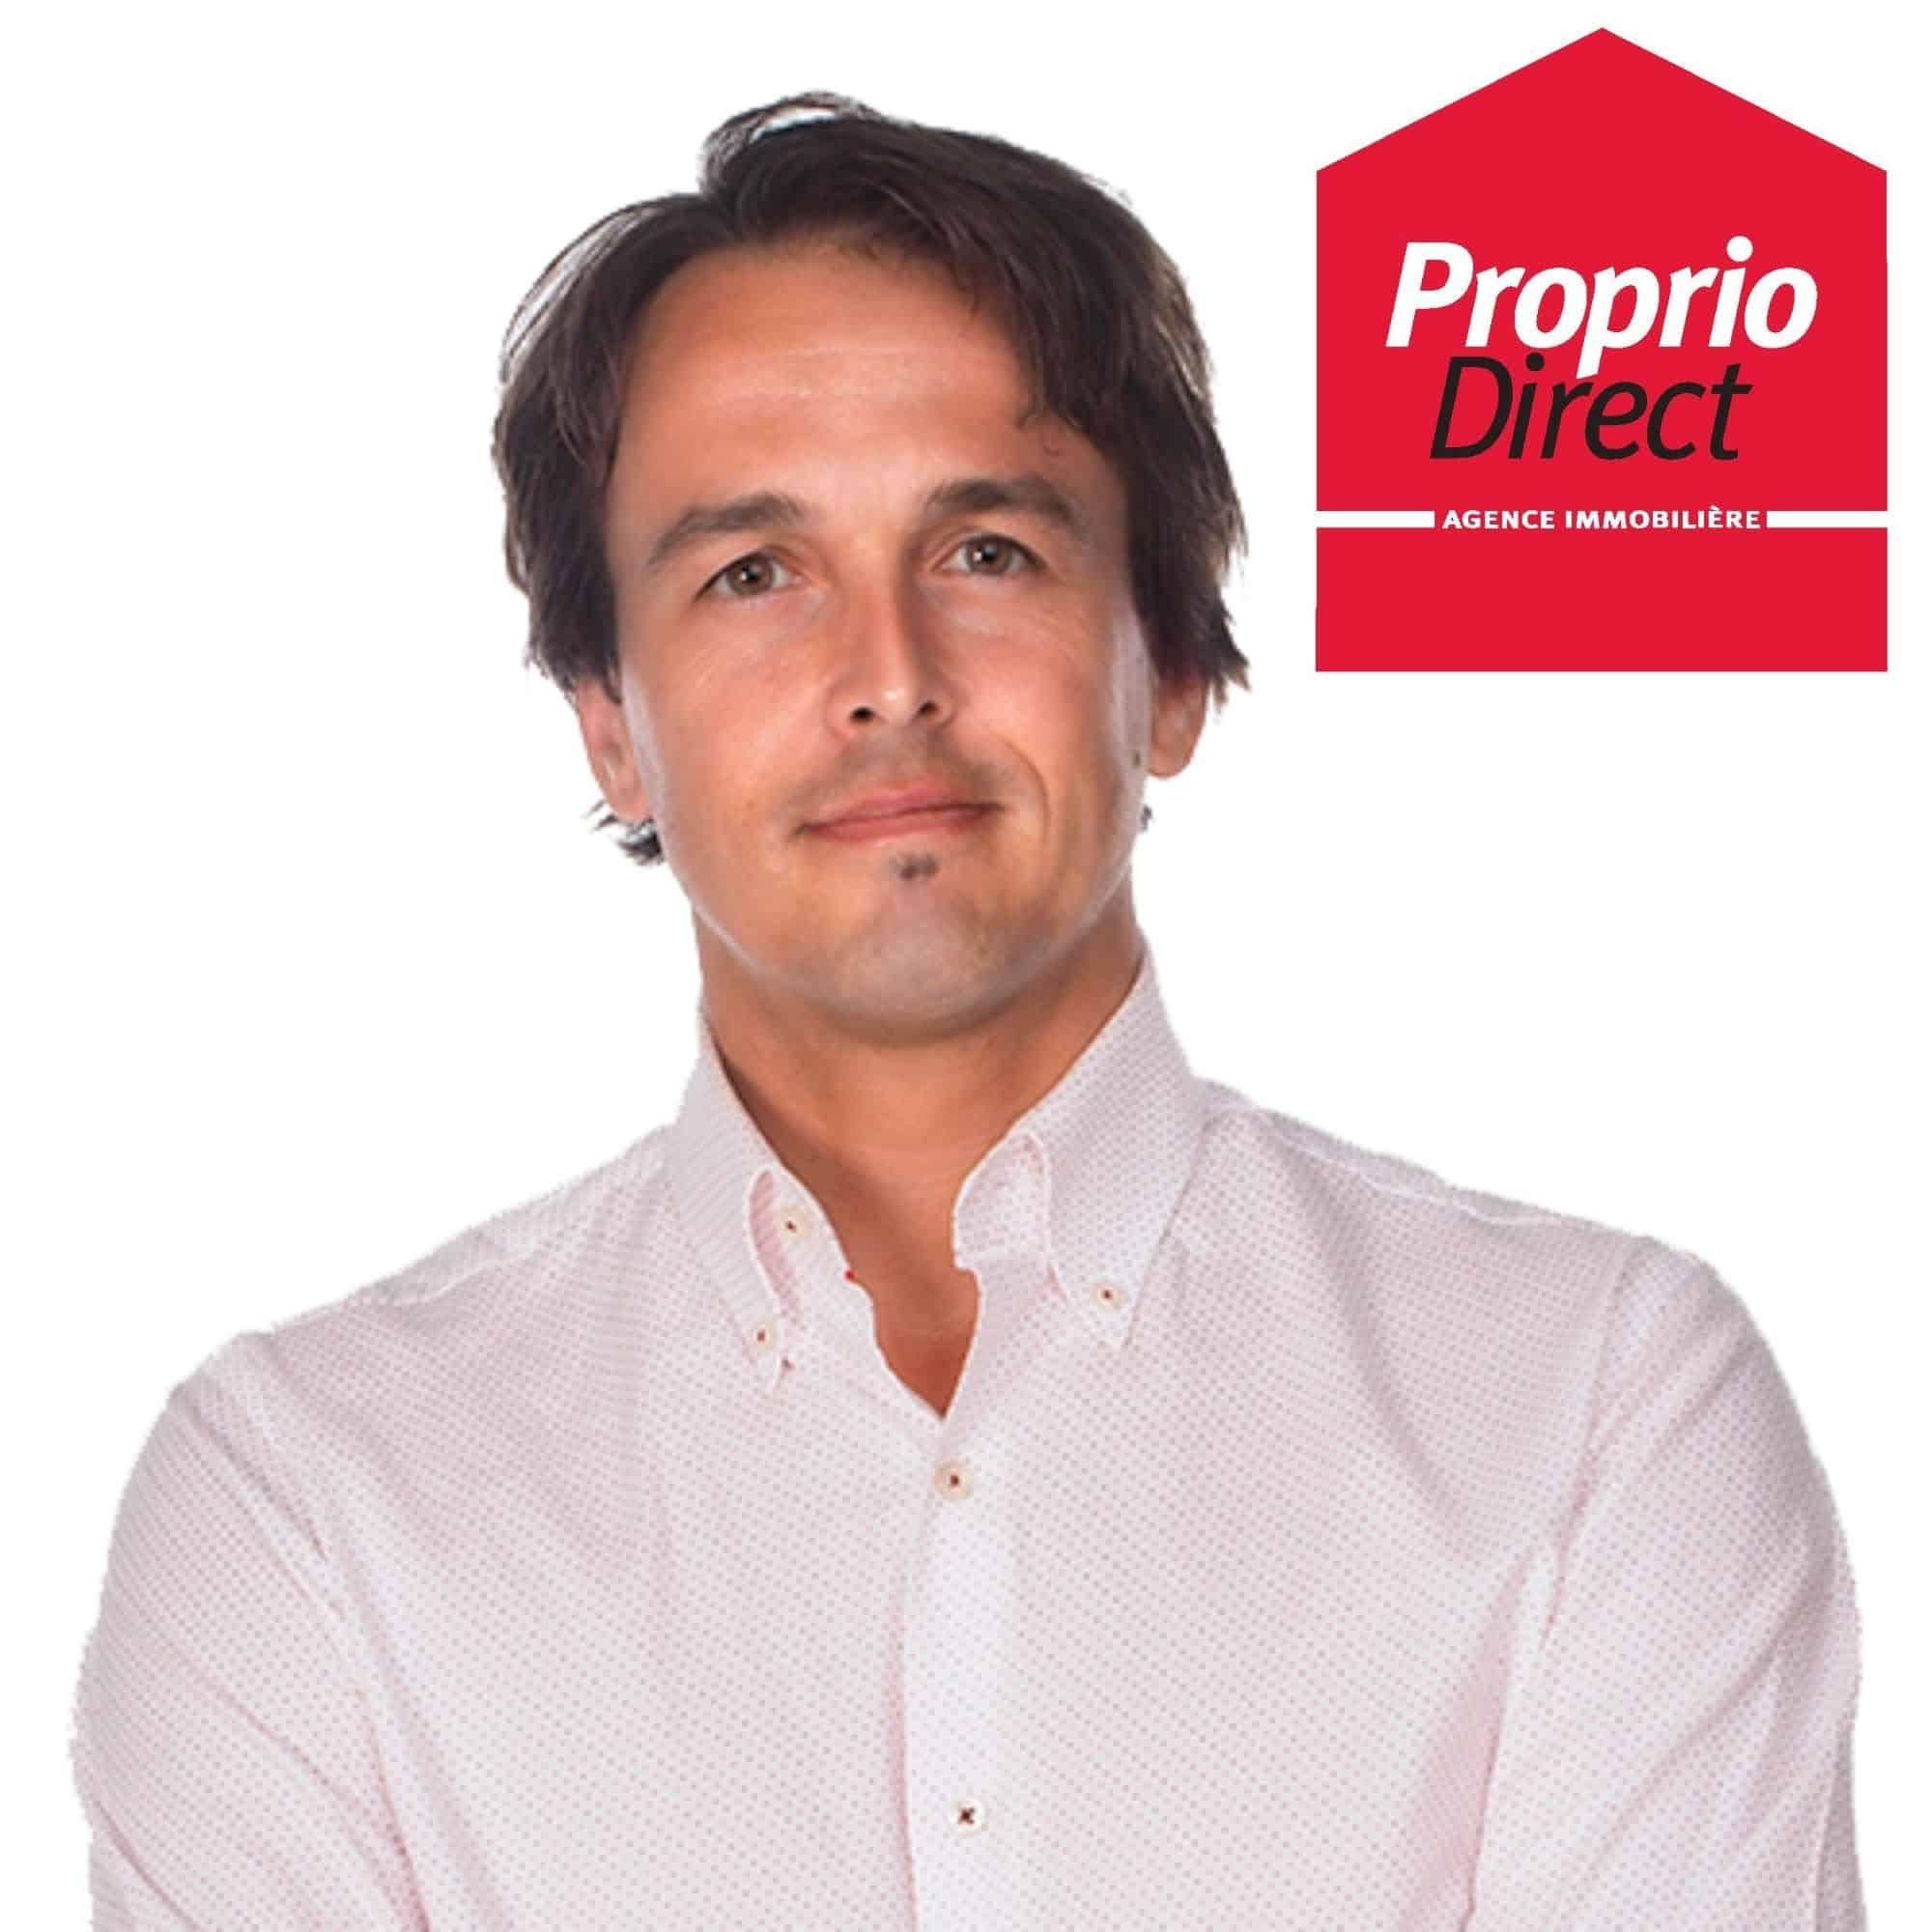 Nicolas Caron, Courtier immobilier résidentiel – Proprio Direct – Équipe Alexandra Amyot inc.